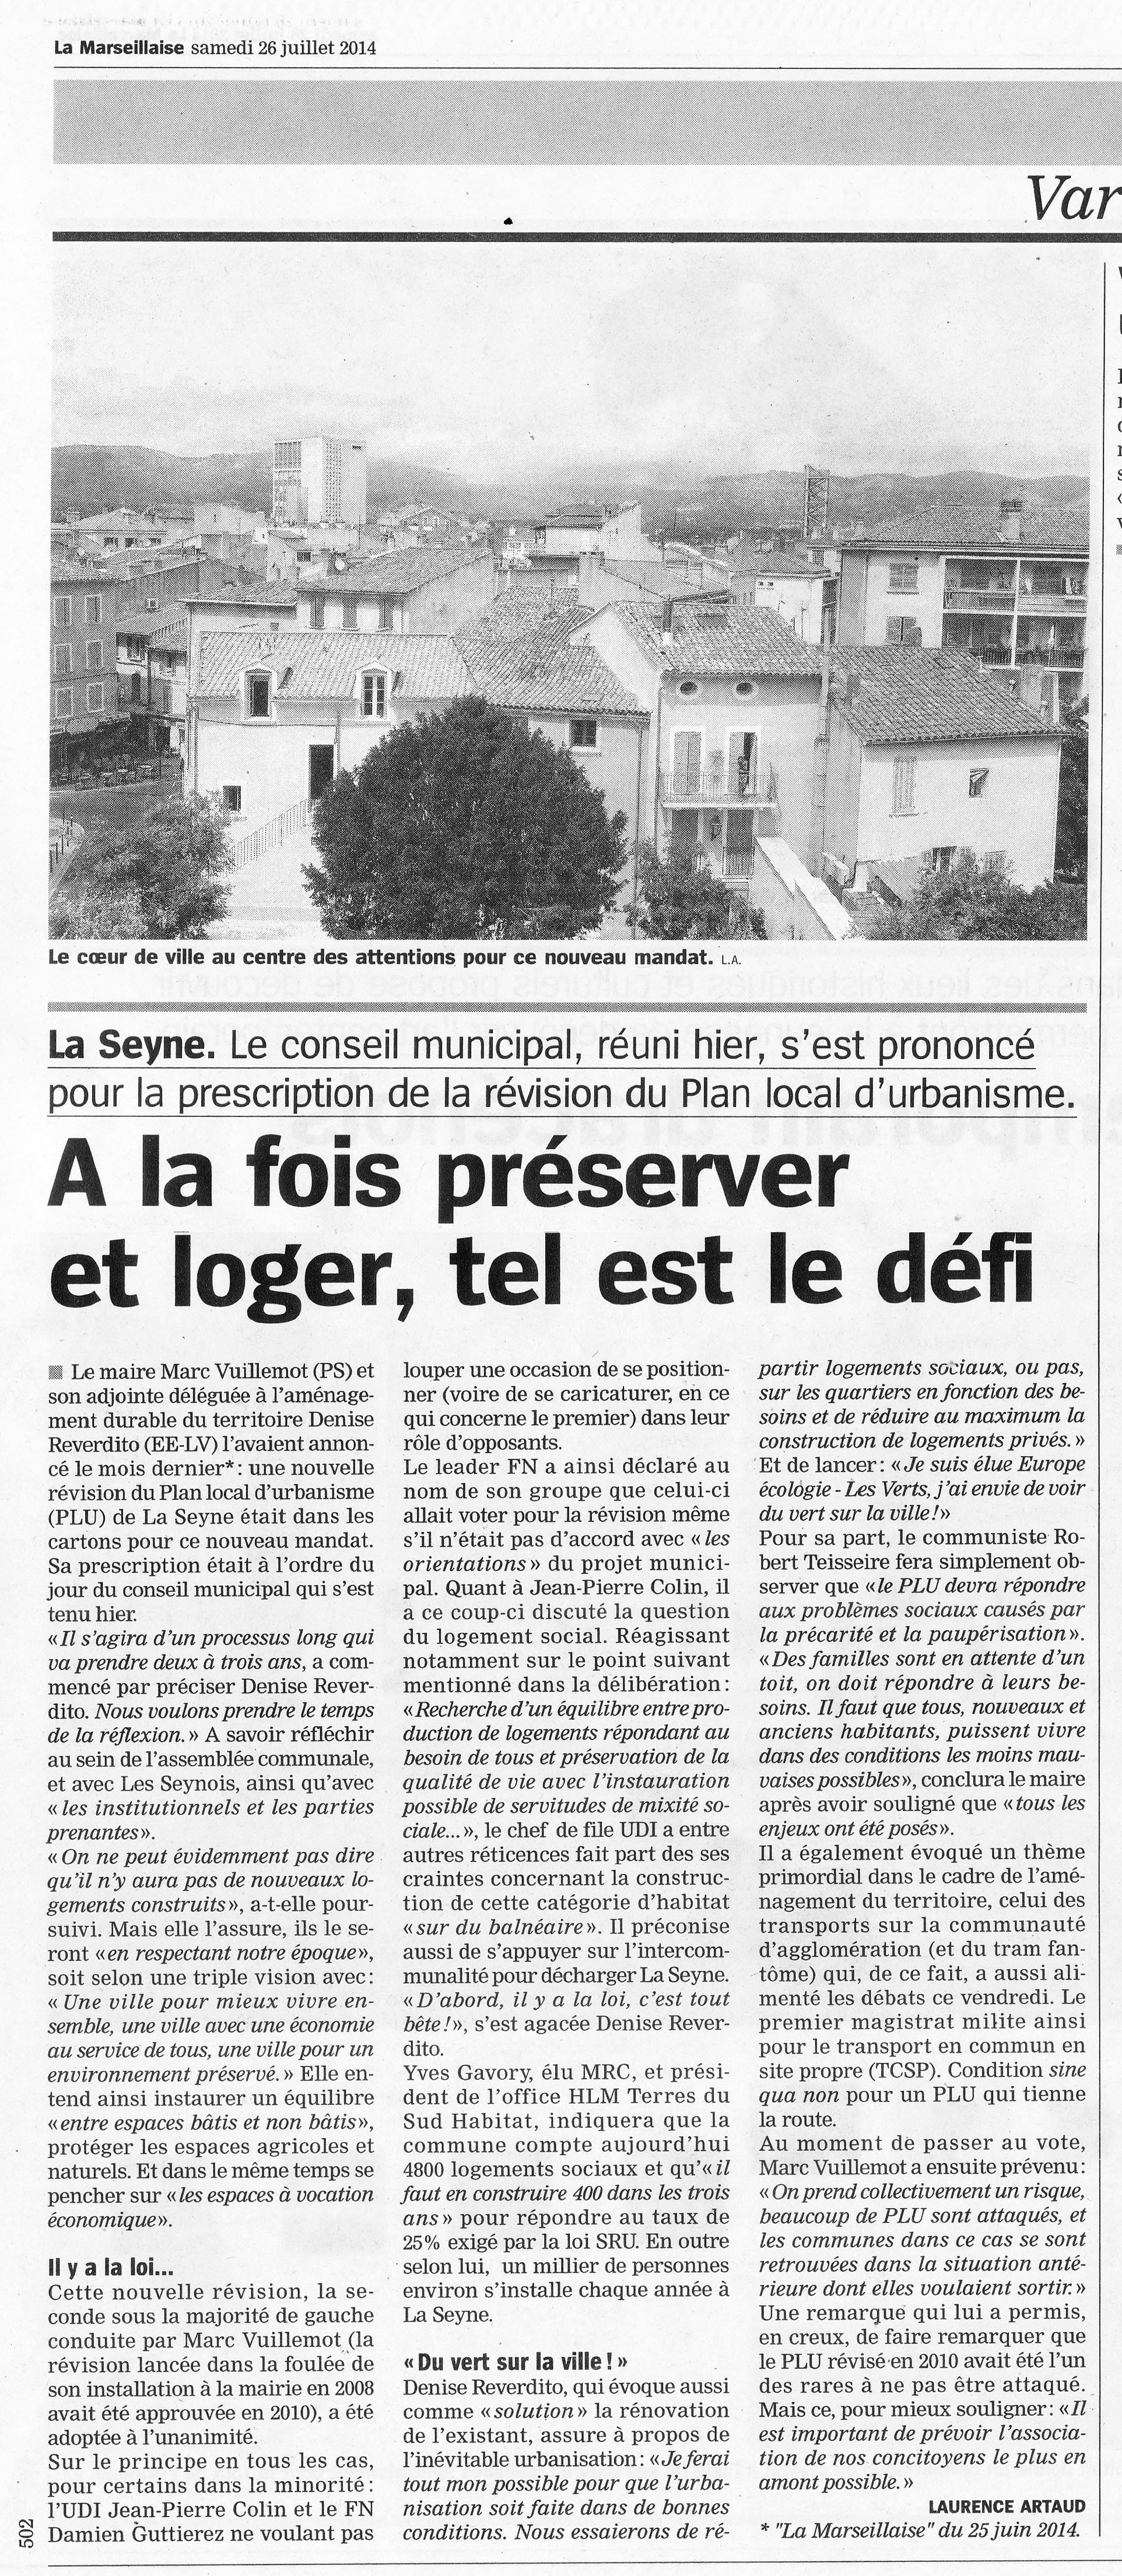 2014 06 25 MARSEILLAISE Révision PLU La Seyne